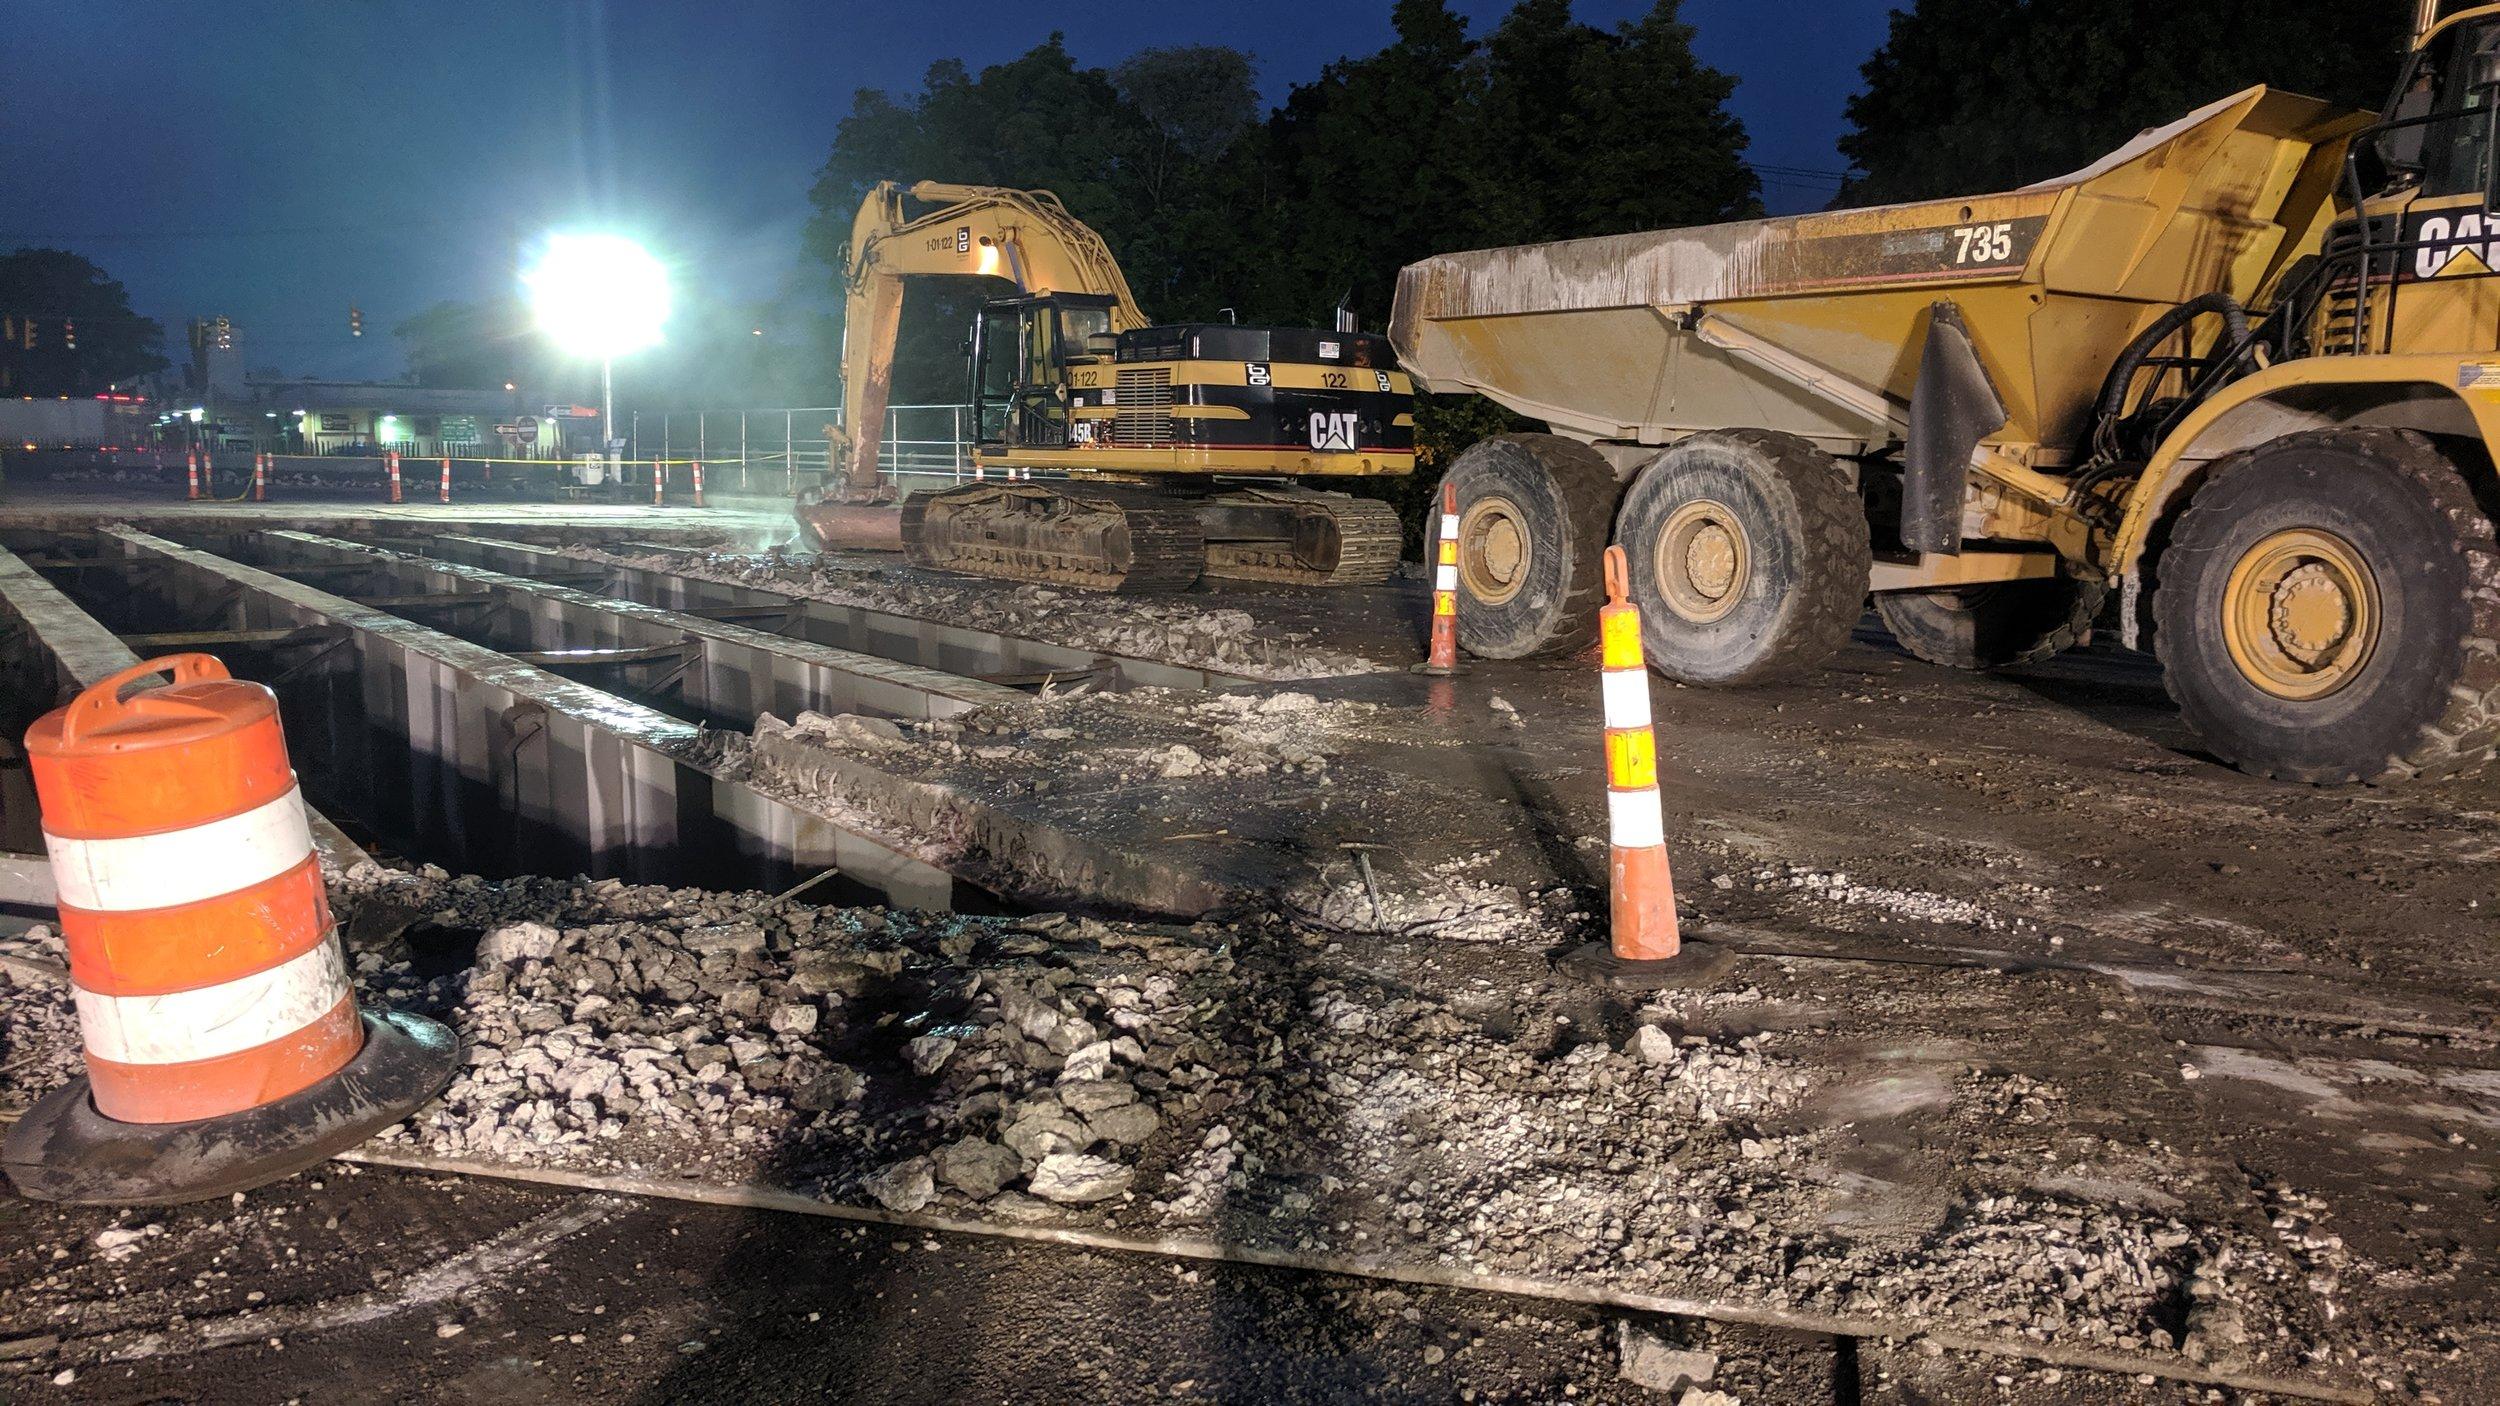 Bridge deck demolition over Northbound I-95.  Taken on night of 5/31/19 by Jonathan Wu